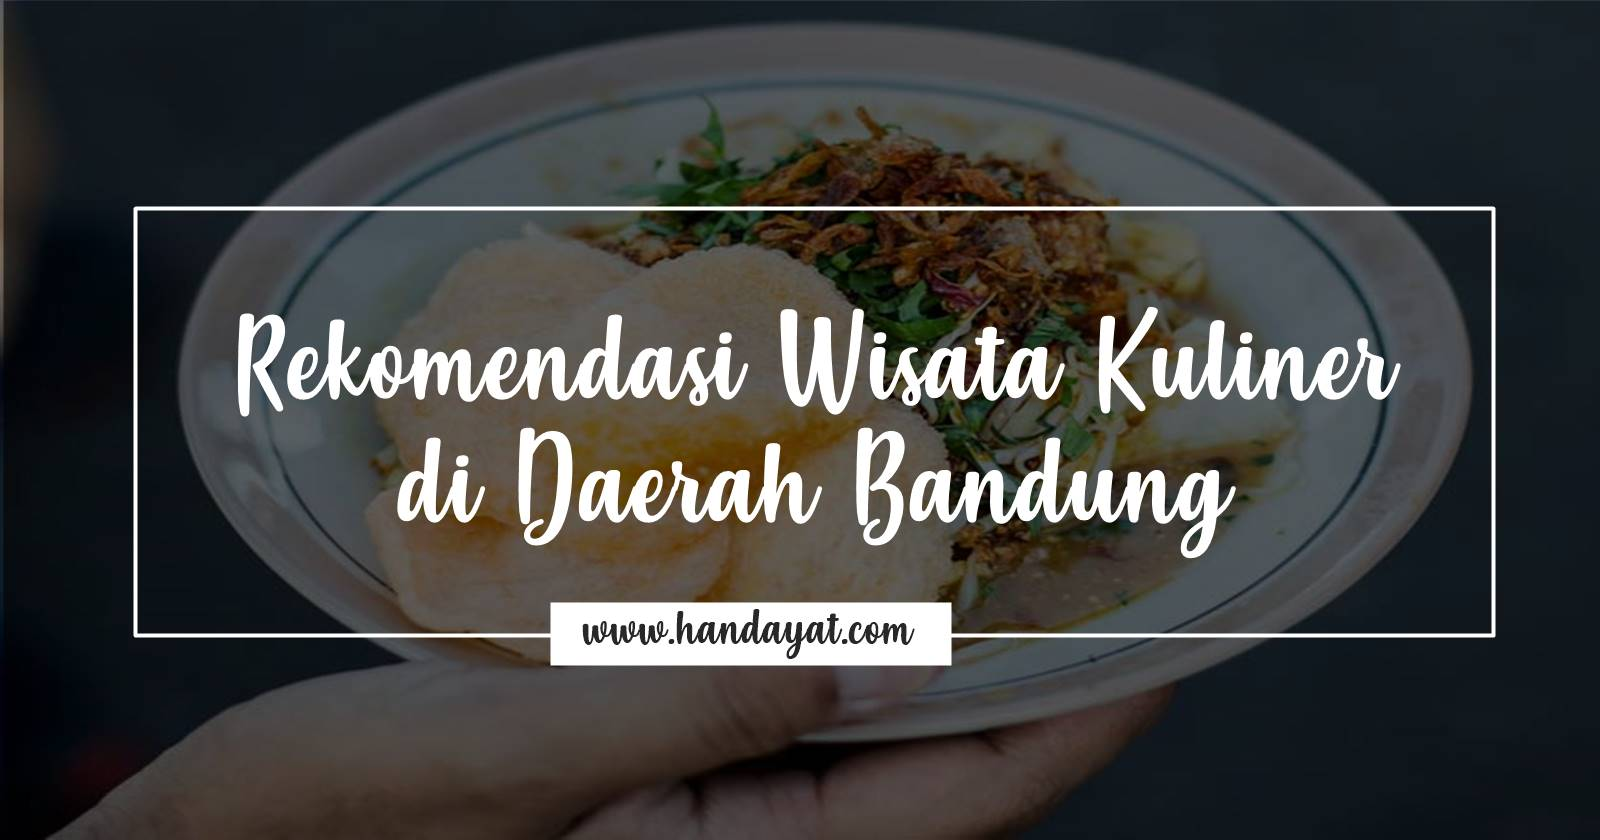 Tempat Wisata Kuliner di Bandung yang Wajib Kamu Coba! 1